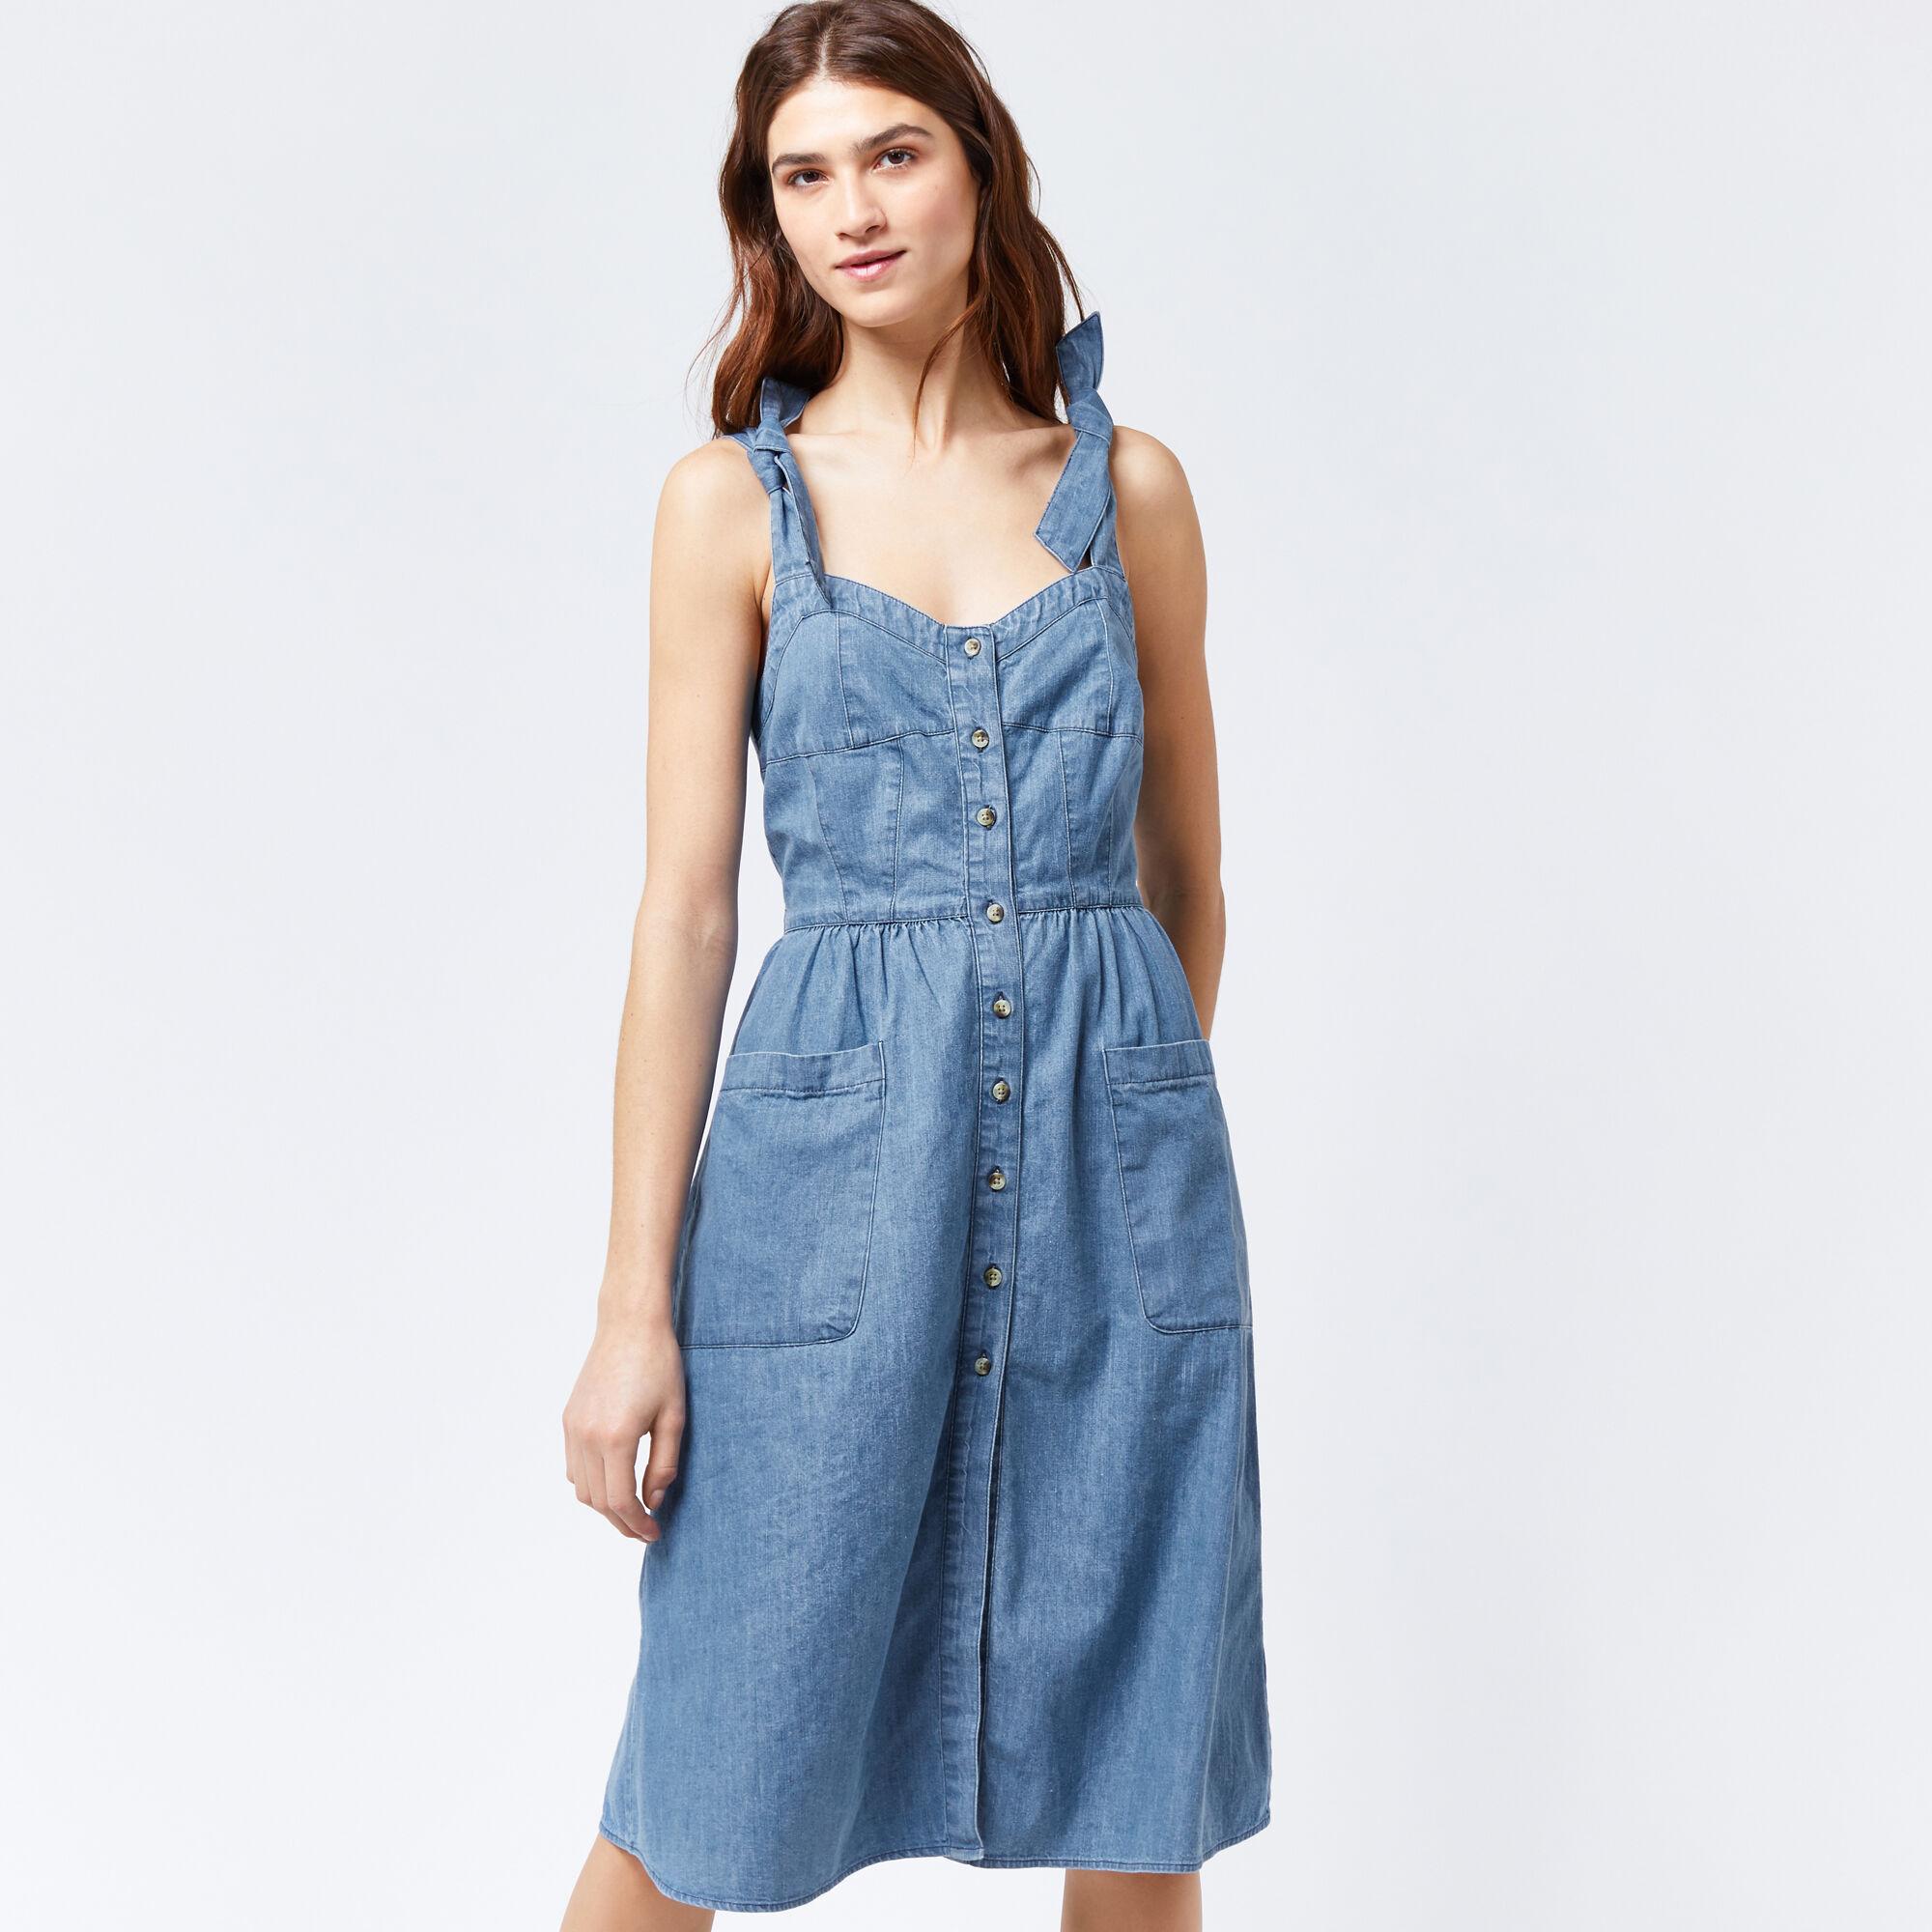 Warehouse, Tie Strap Pocket Dress Light Wash Denim 1